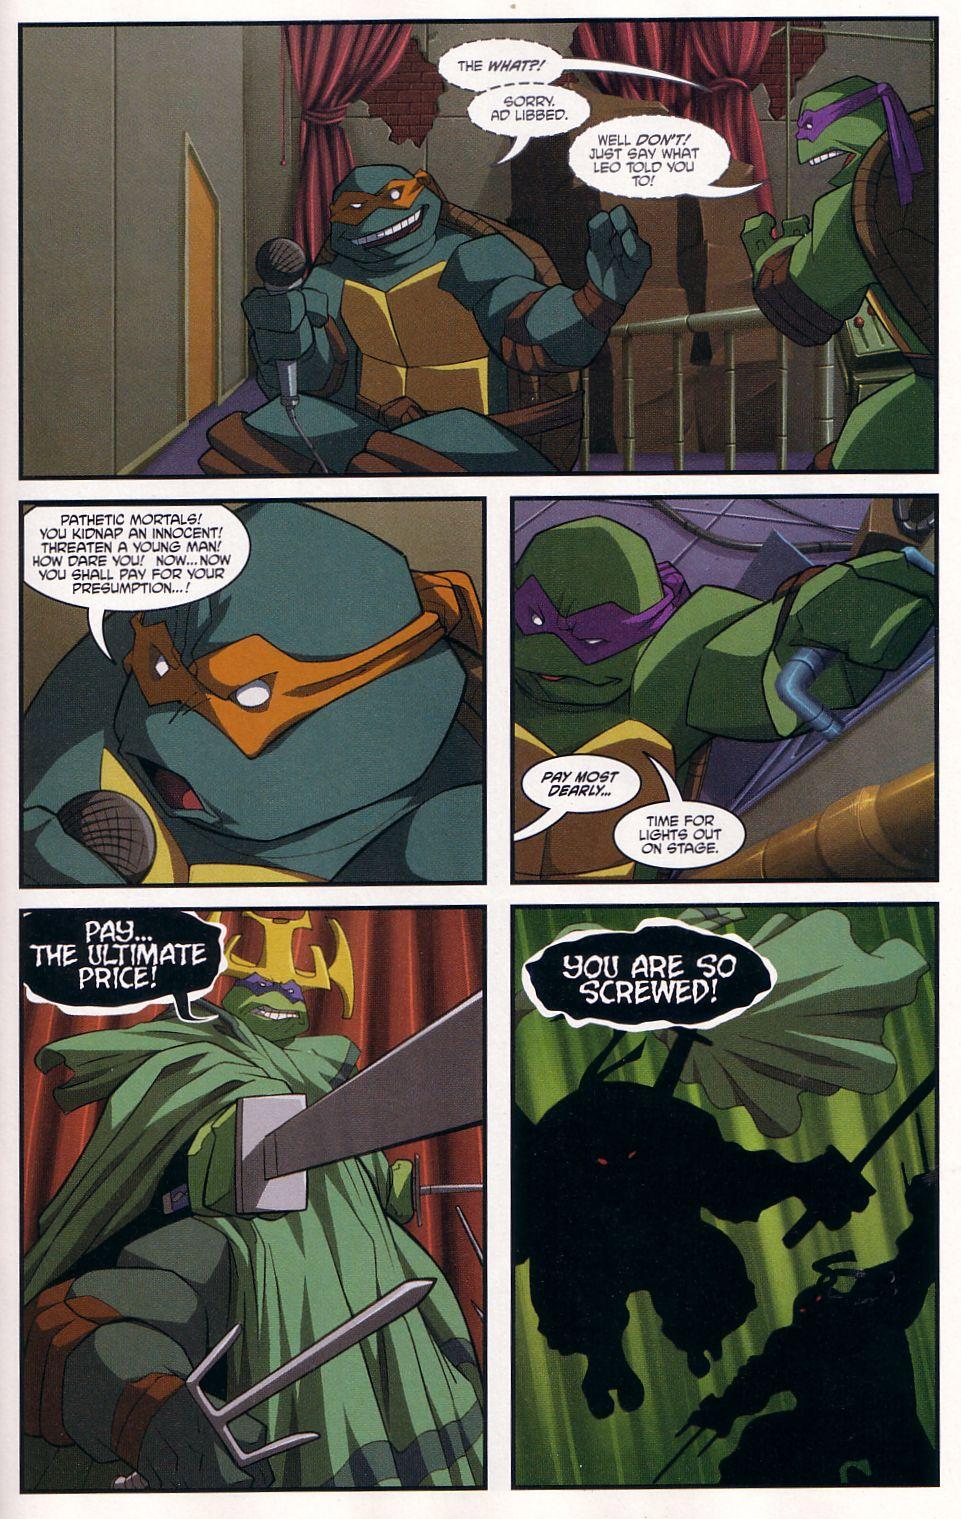 Teenage Mutant Ninja Turtles (2003) chap 7 pic 21